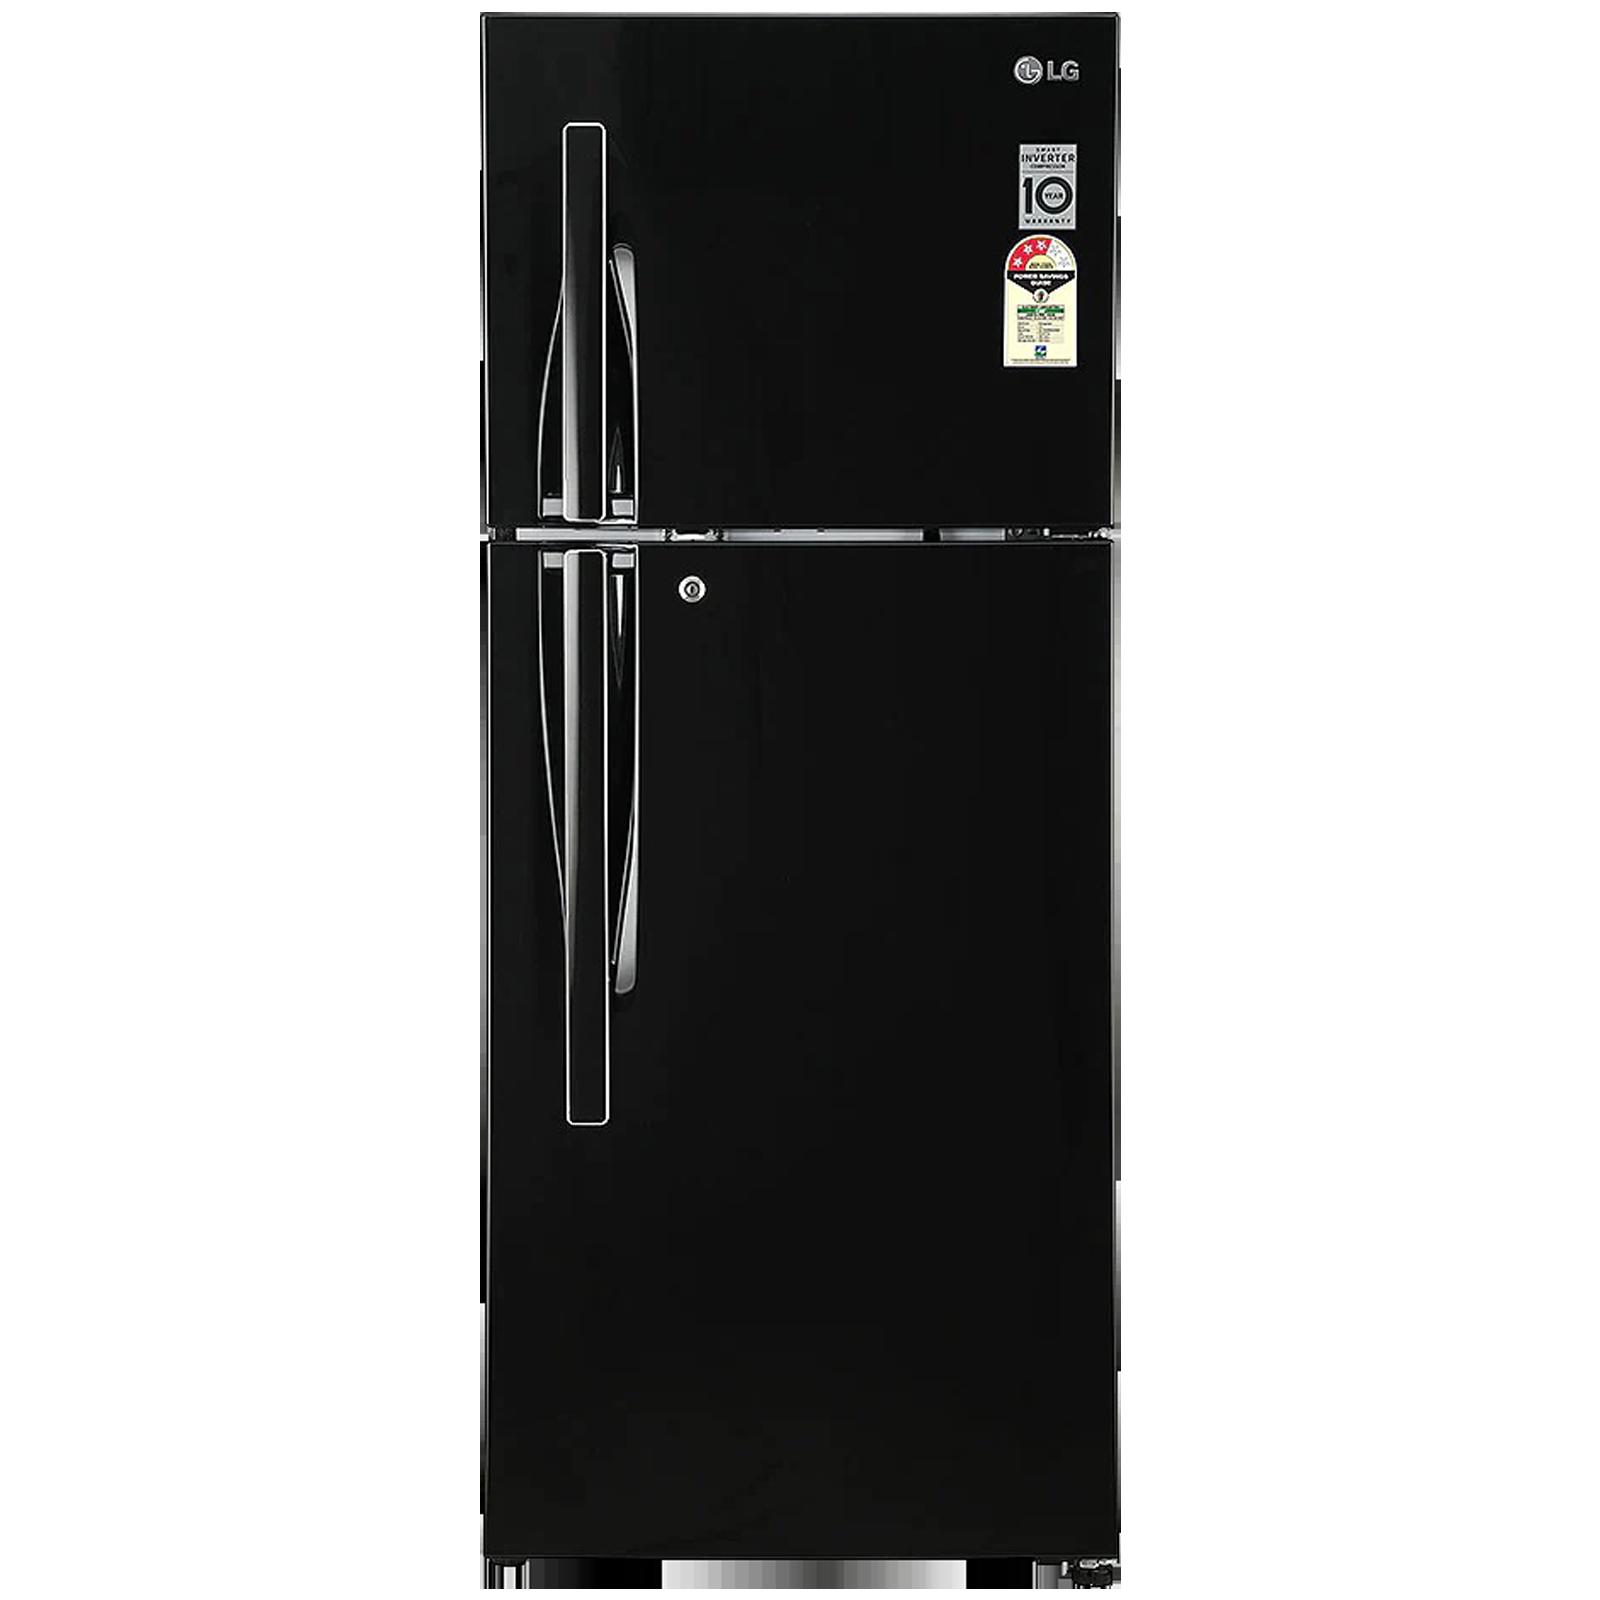 LG 260 Litres 3 Star Frost Free Smart Inverter Double Door Refrigerator (Convertible Plus, GL-T292RESX, Ebony Sheen)_1